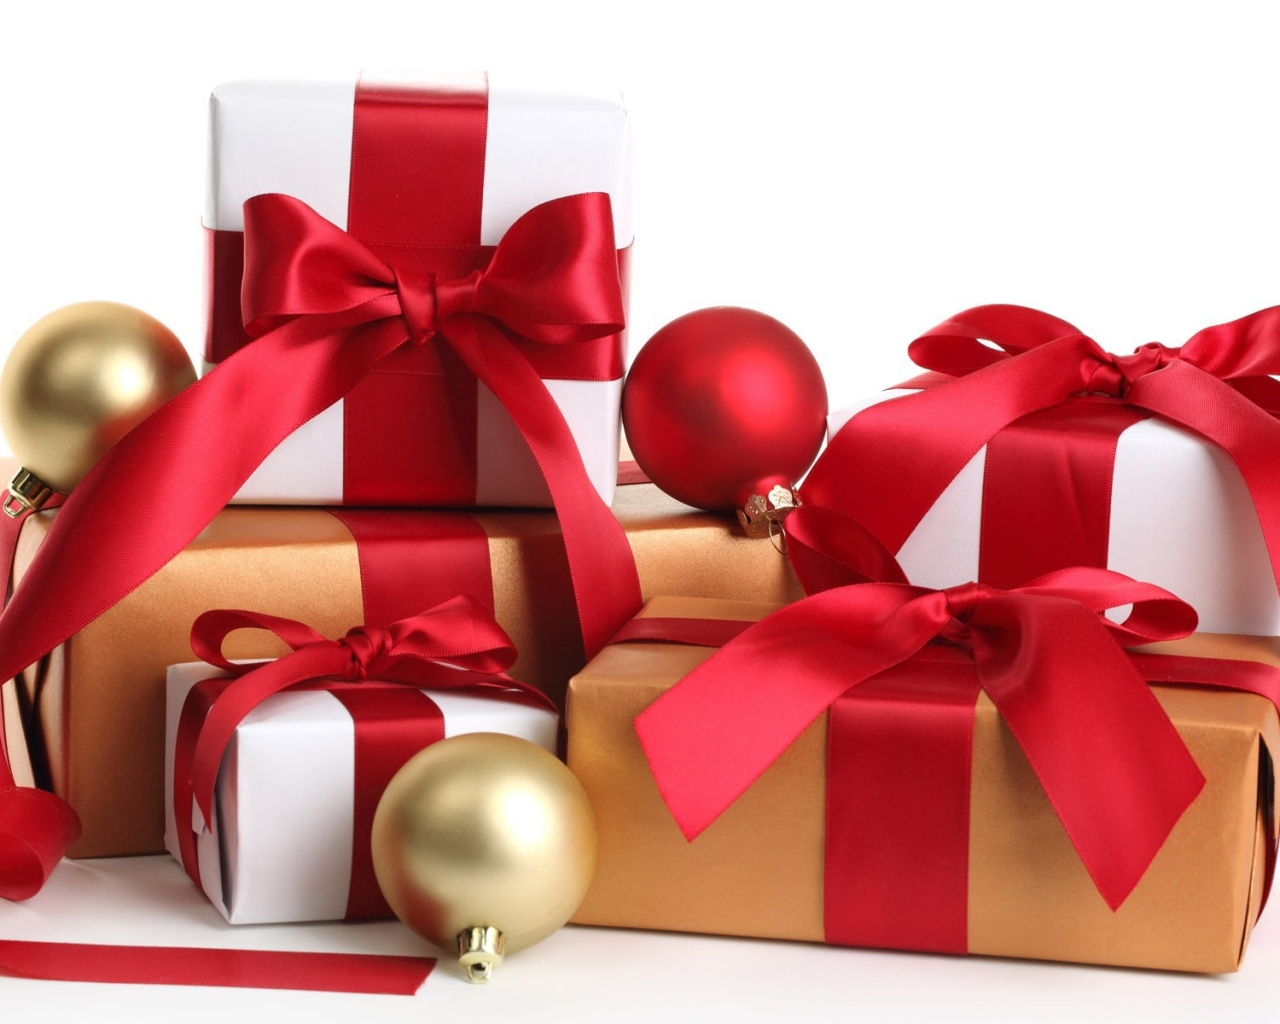 Lazo para forrar regalos - 1280x1024